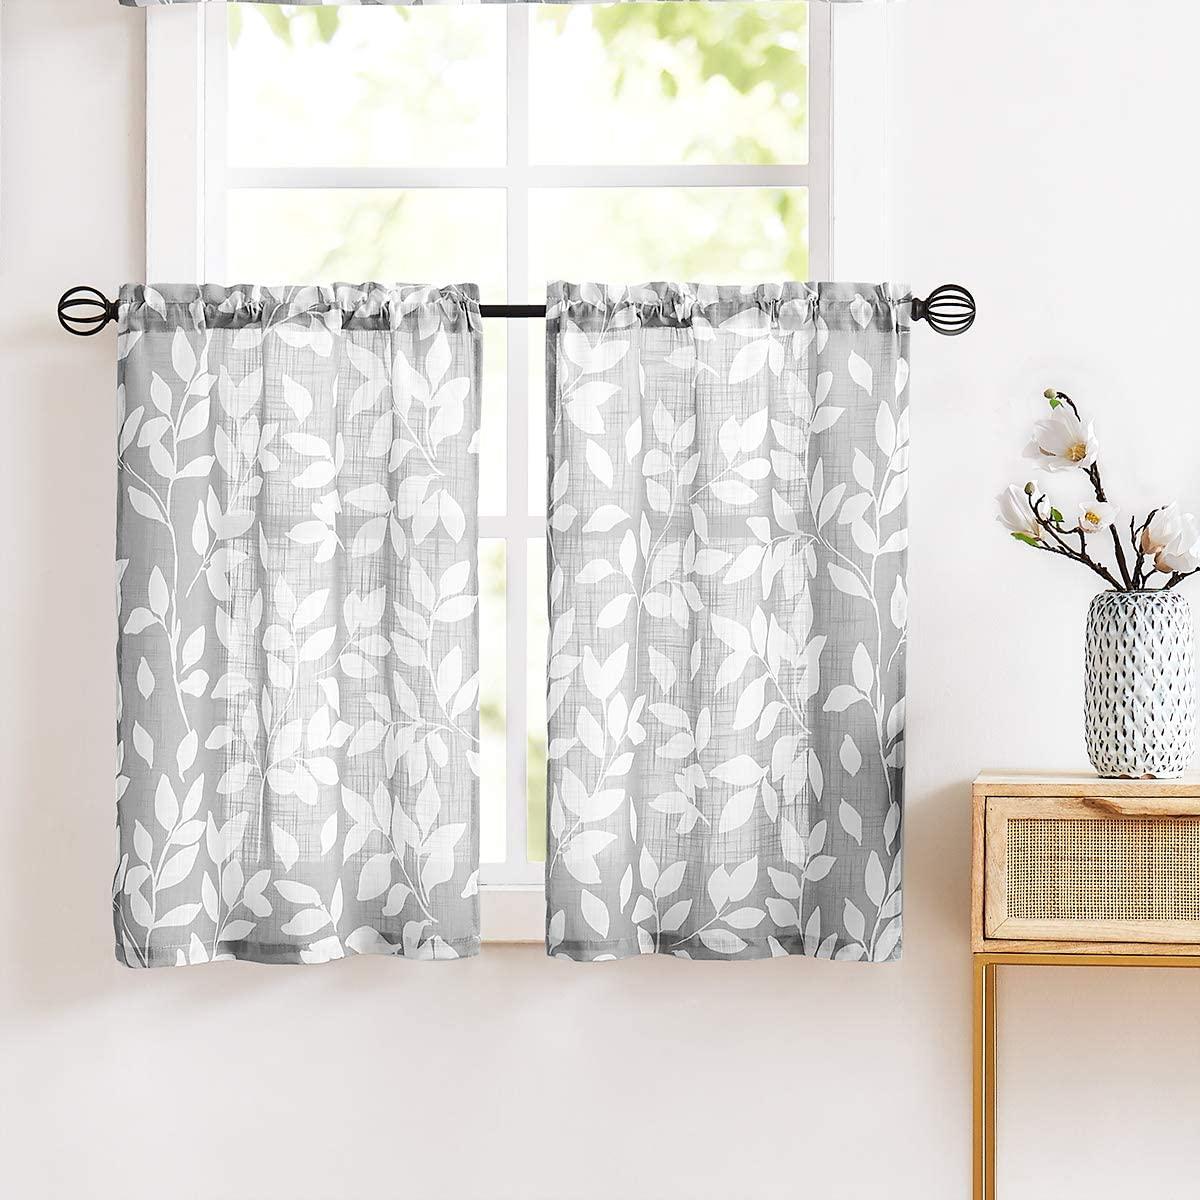 Treatmentex Grey Tier Curtains 24 Kitchen Curtain Set Leaf Print Small Window Curtains for Basement 2 Panels